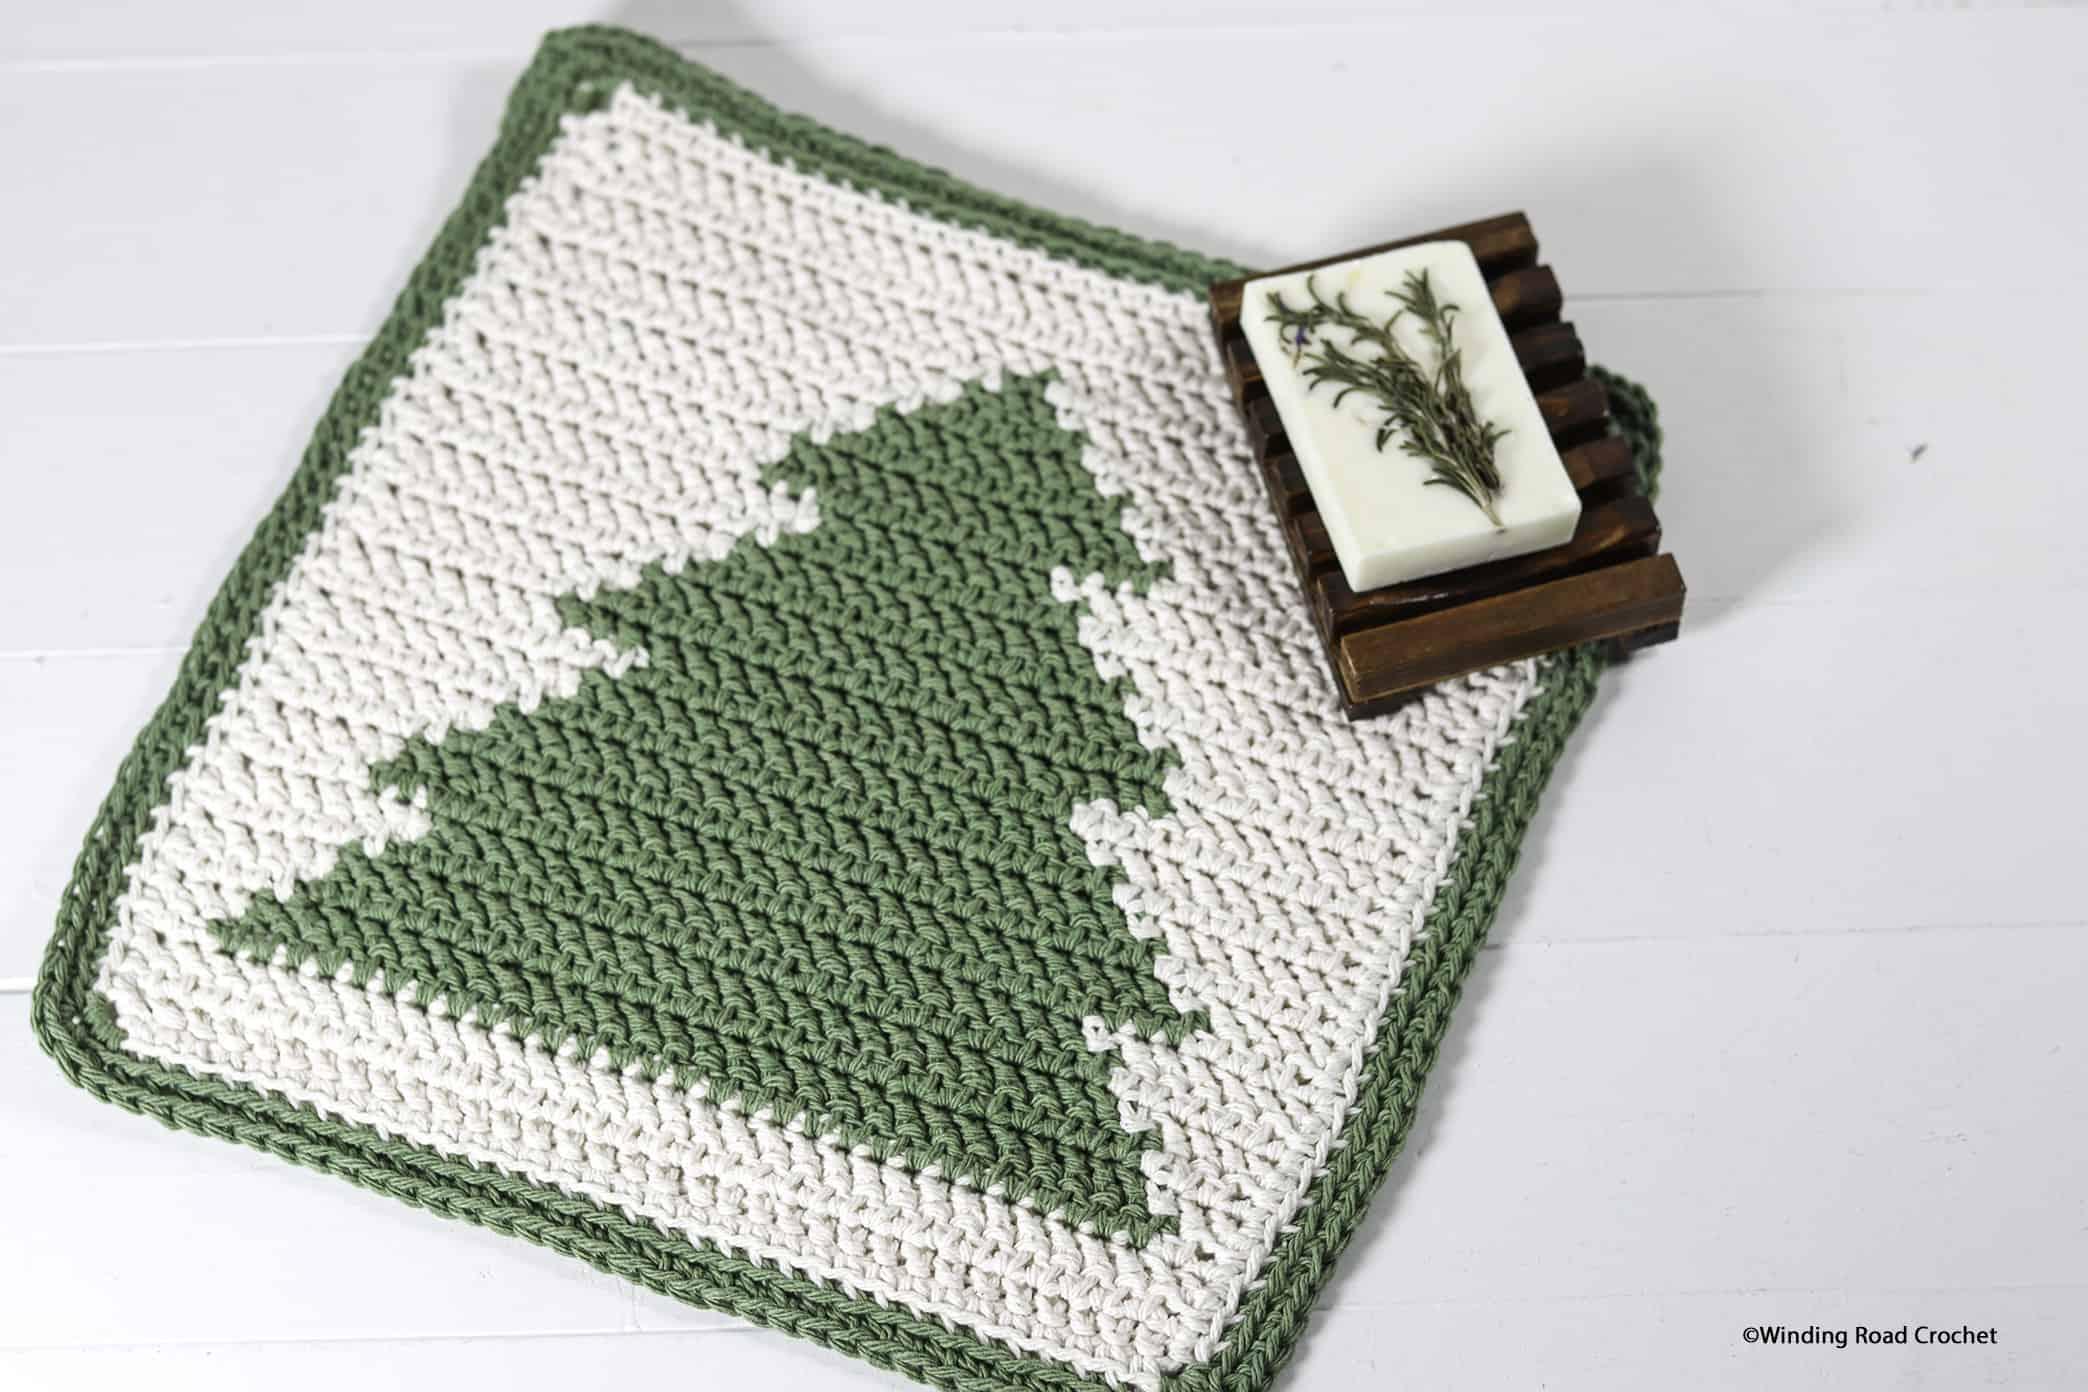 Evergreen Crochet Washcloth Simple Free Pattern Winding Road Crochet